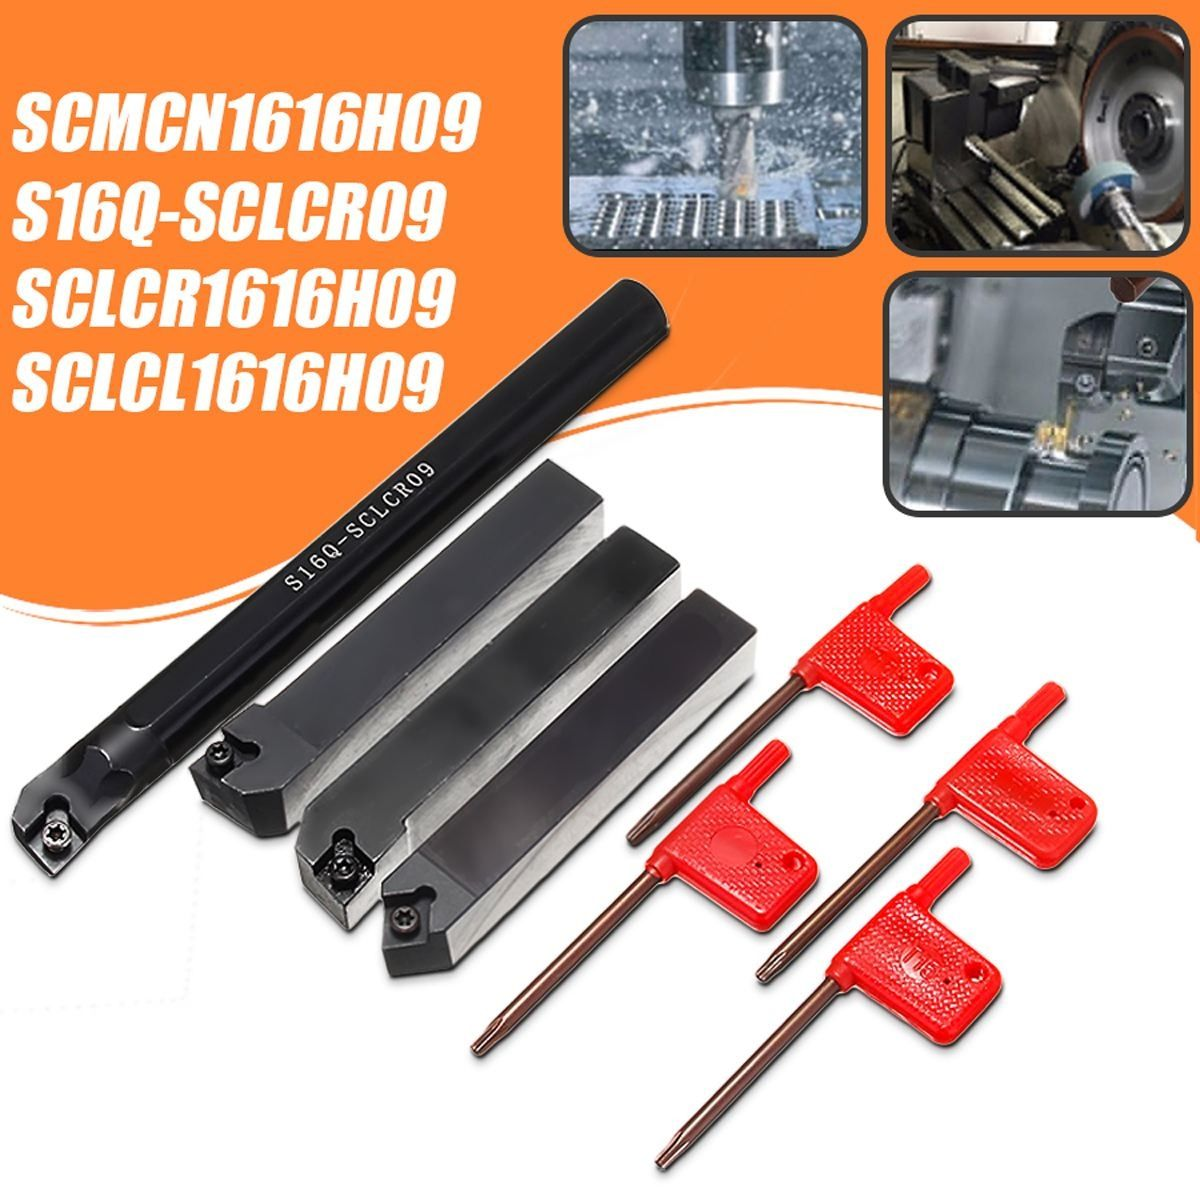 4 Satz 16mm SCLCR Drehmaschine Drehen Werkzeughalter Bohrstange + 4 stücke T15 Schraubenschlüssel S16Q-SCLCR09/SCLCR1616H09/SCLCL1616H09/SCMCN1616H09